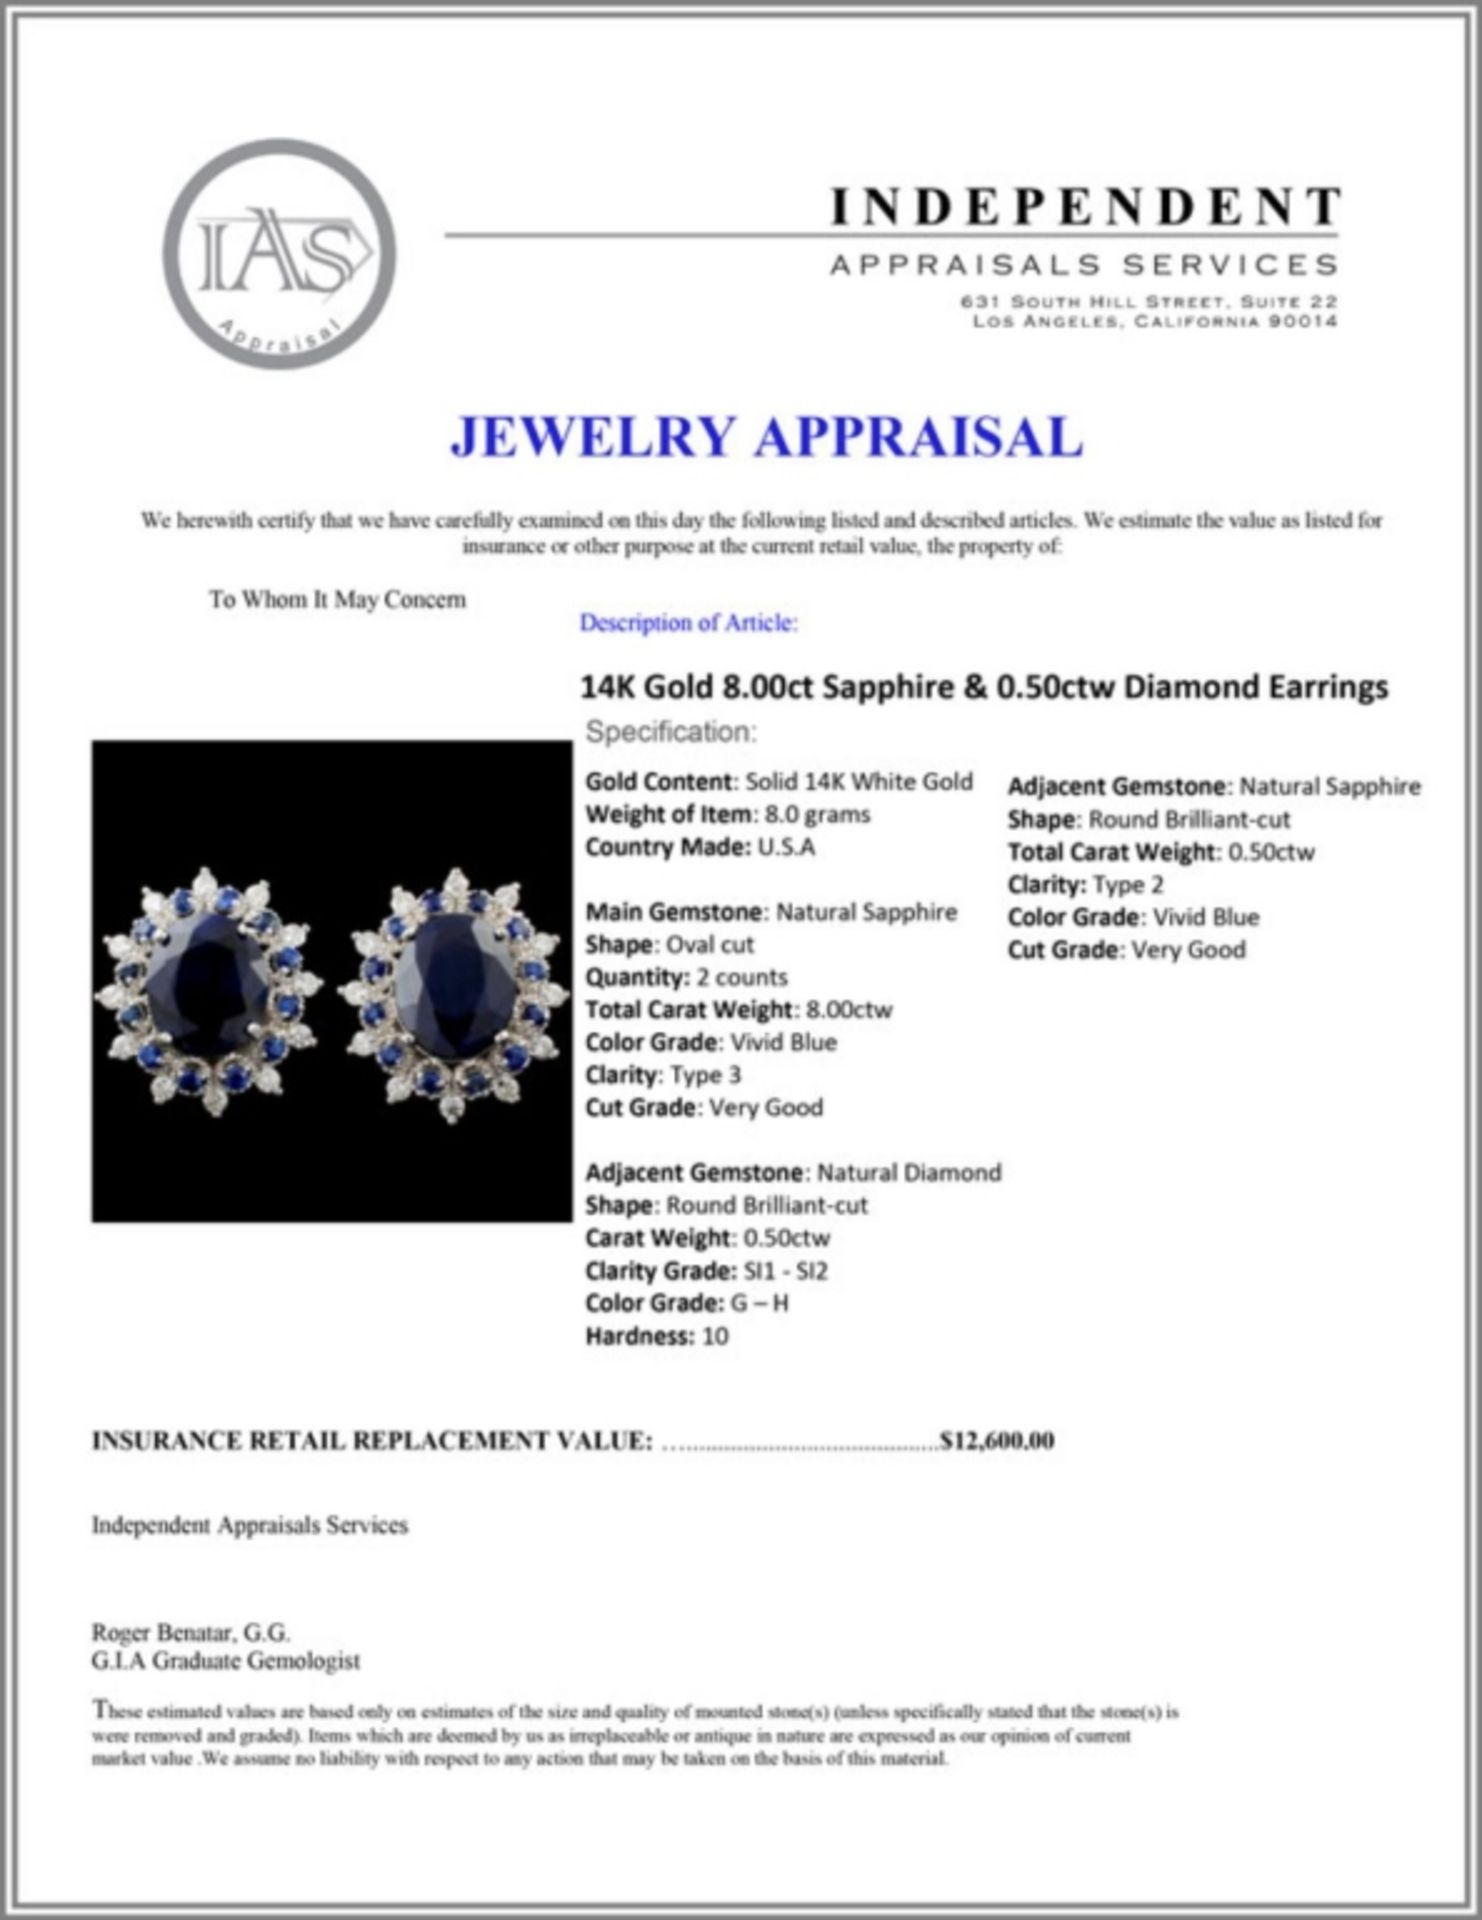 14K Gold 8.00ct Sapphire & 0.50ctw Diamond Earring - Image 3 of 3